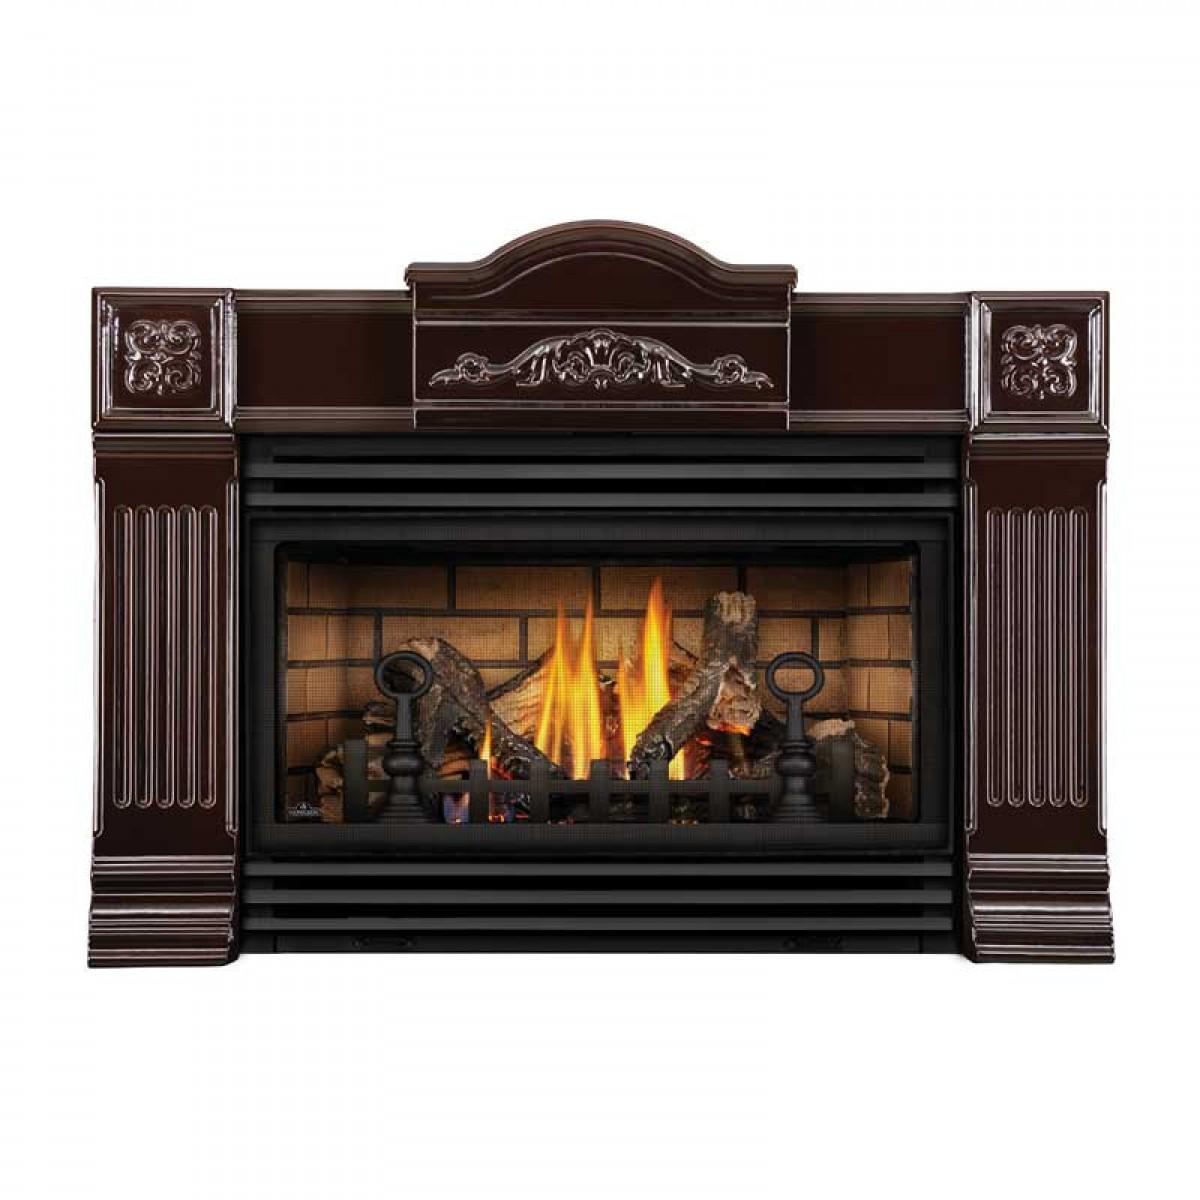 Napoleon Gdi30nsb Basic Fireplace Insert W Glass Door At